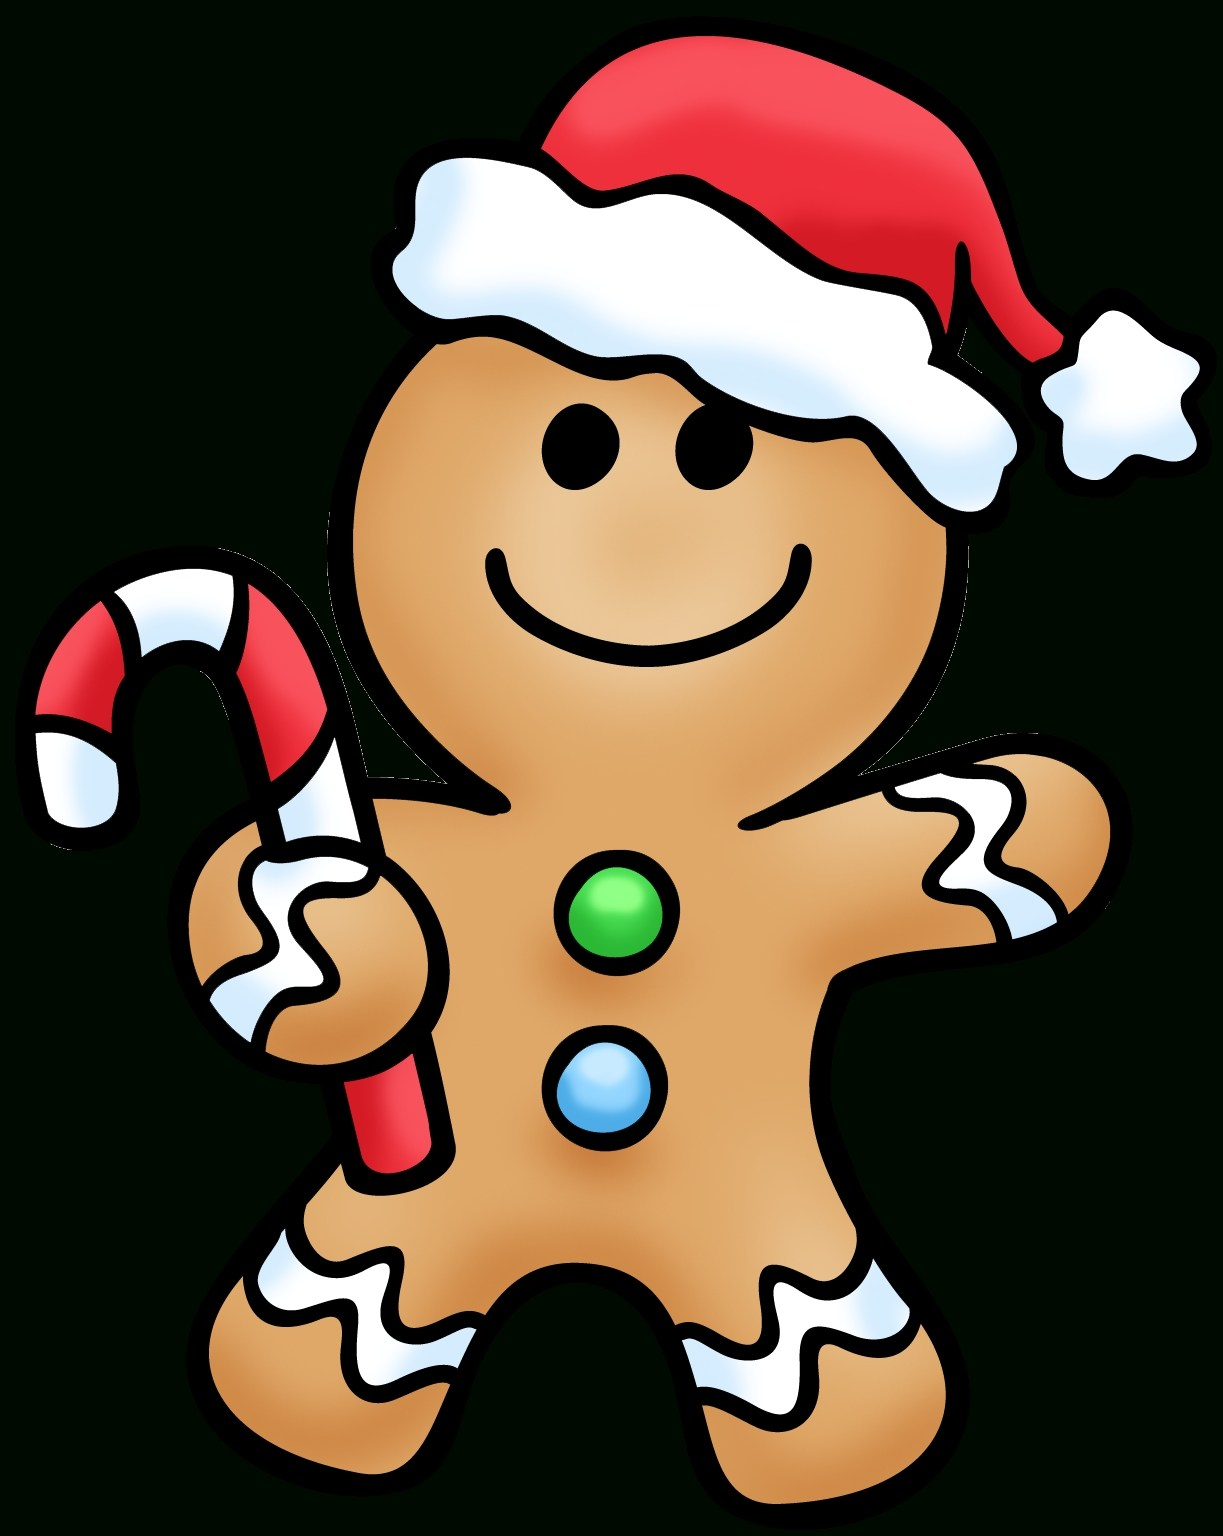 1223x1536 Cartoon Christmas Gingerbread Man Simple Living Tree In